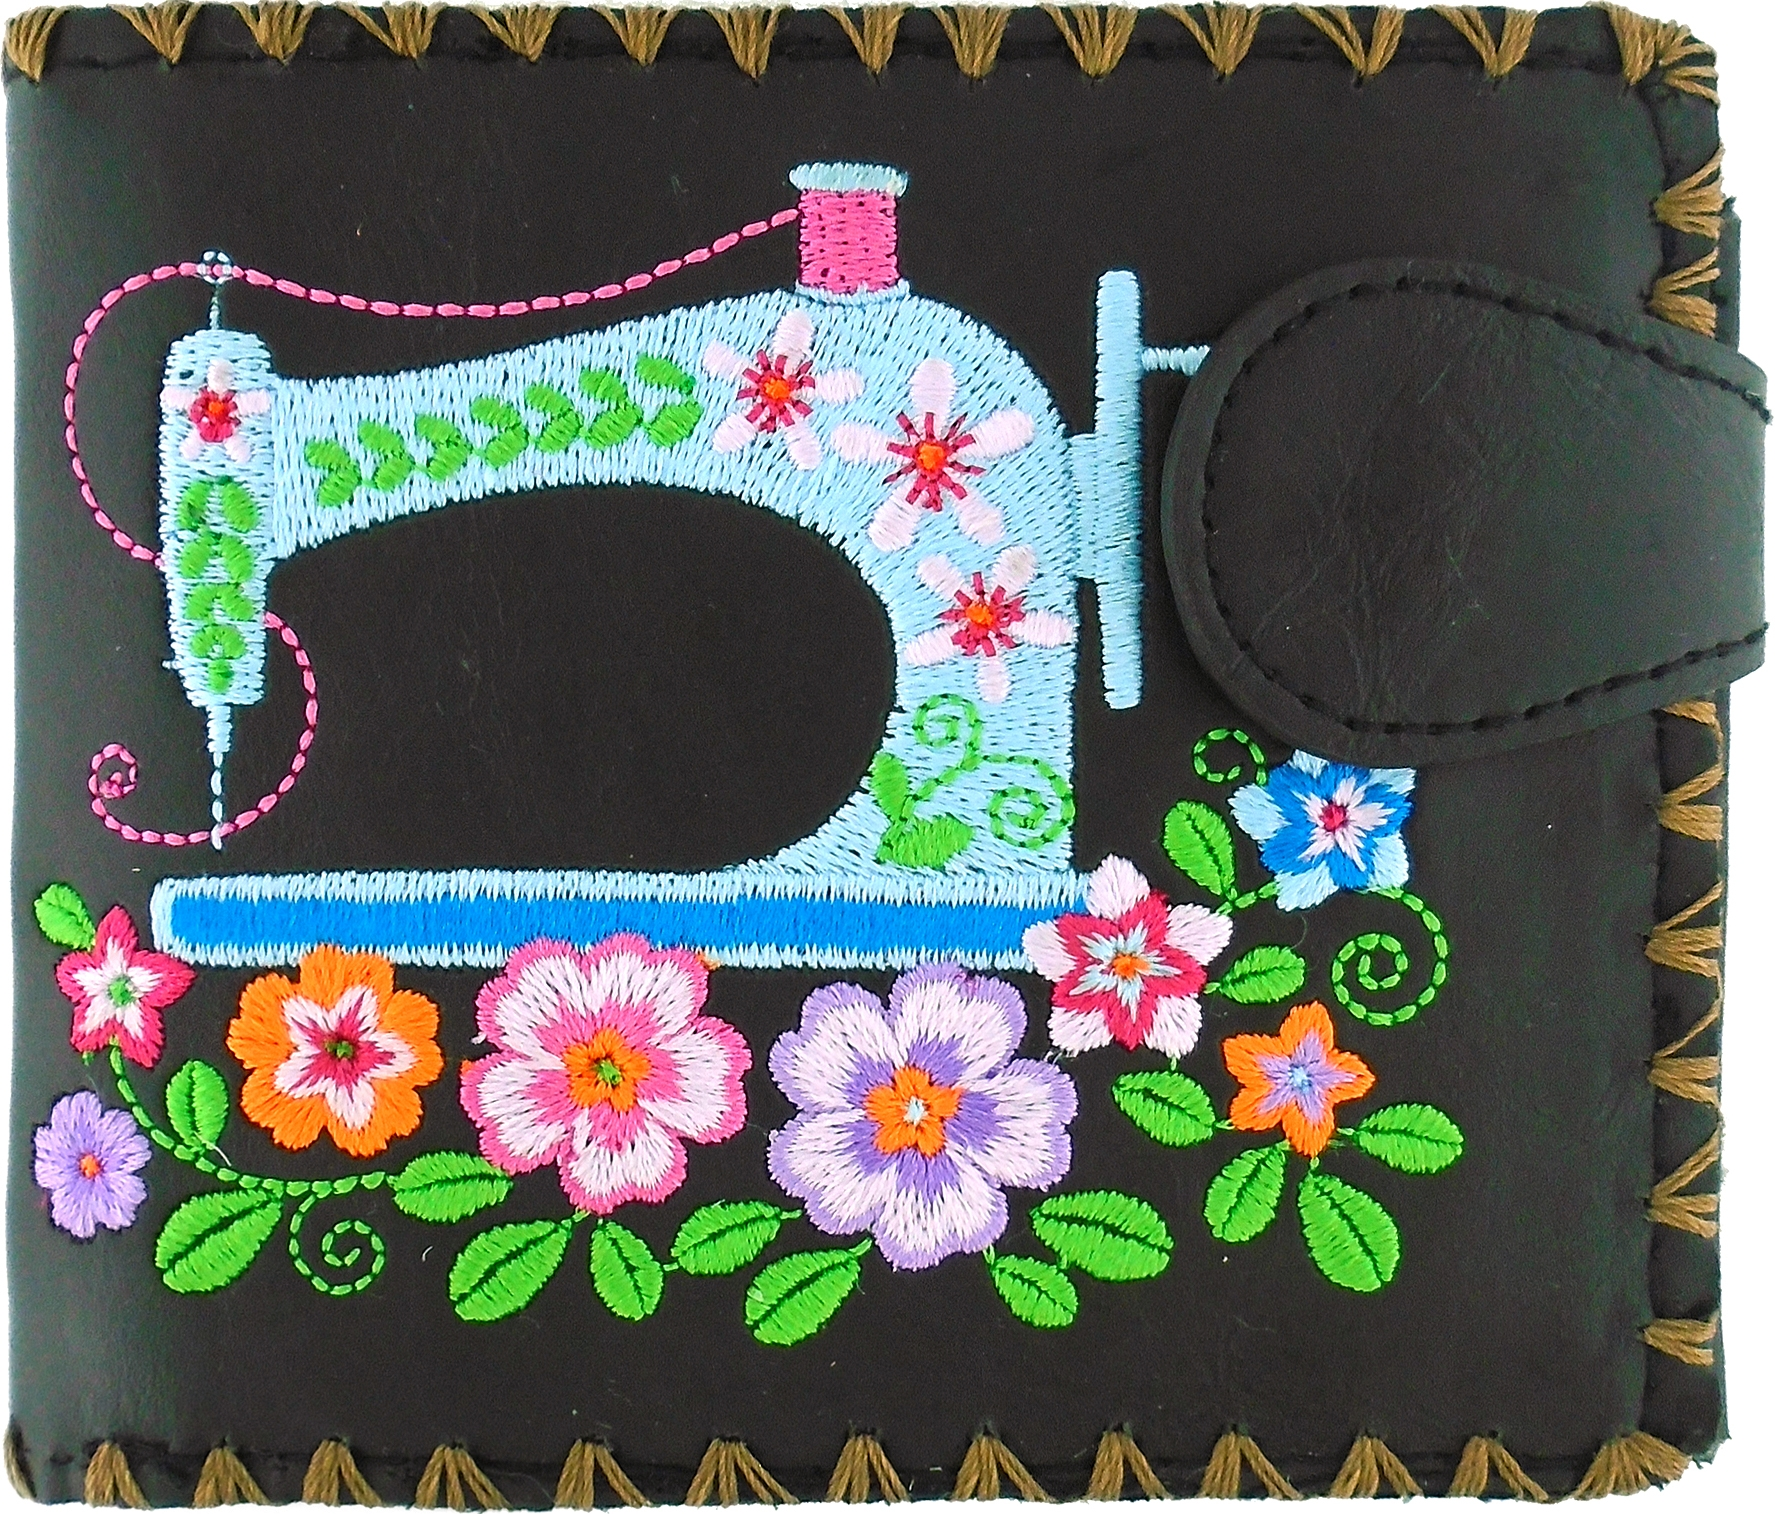 Sewing Machine Medium Embroidered Wallet - Black